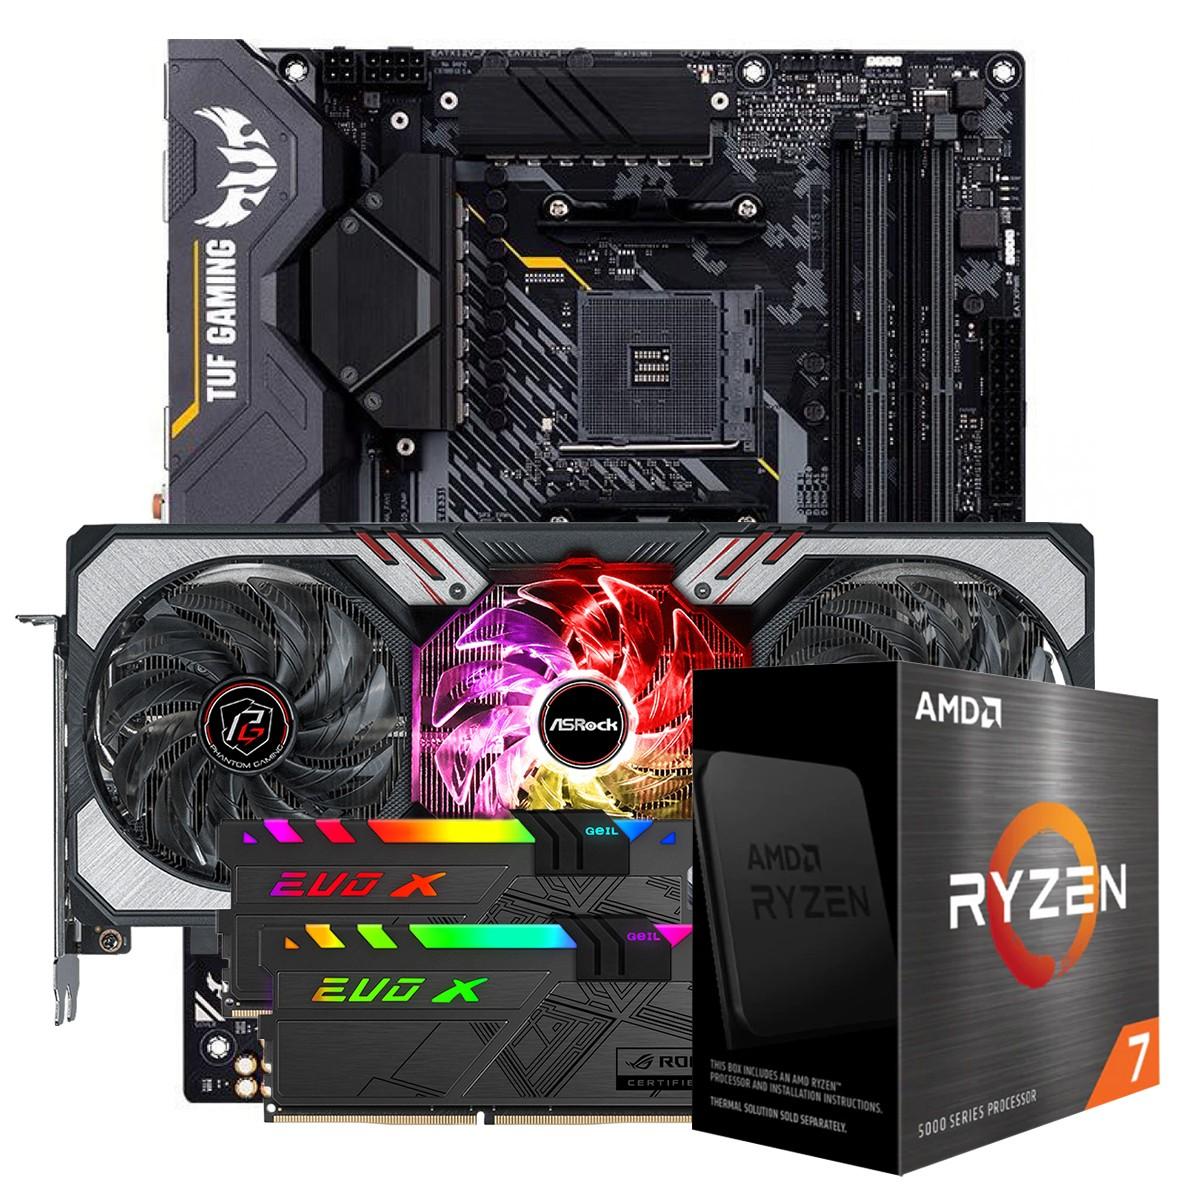 Kit Upgrade ASRock Radeon RX 6700 XT Phantom Gaming D OC + AMD Ryzen 7 5800X + ASUS TUF Gaming X570-Plus + Memória DDR4 16GB (2x8GB) 3600MHz